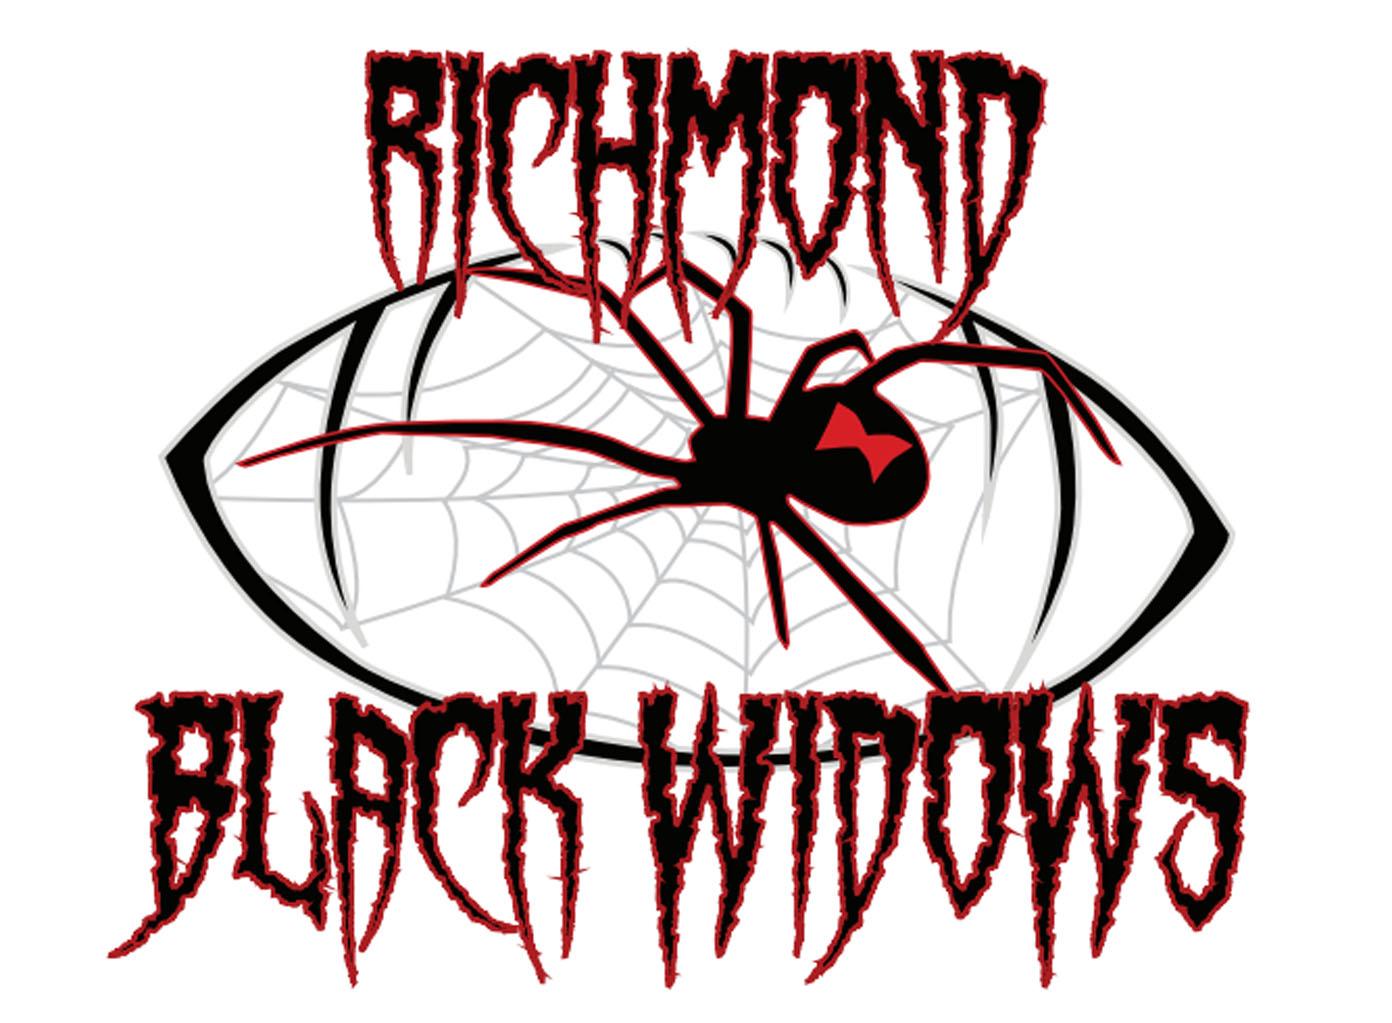 Richmond Black Widows